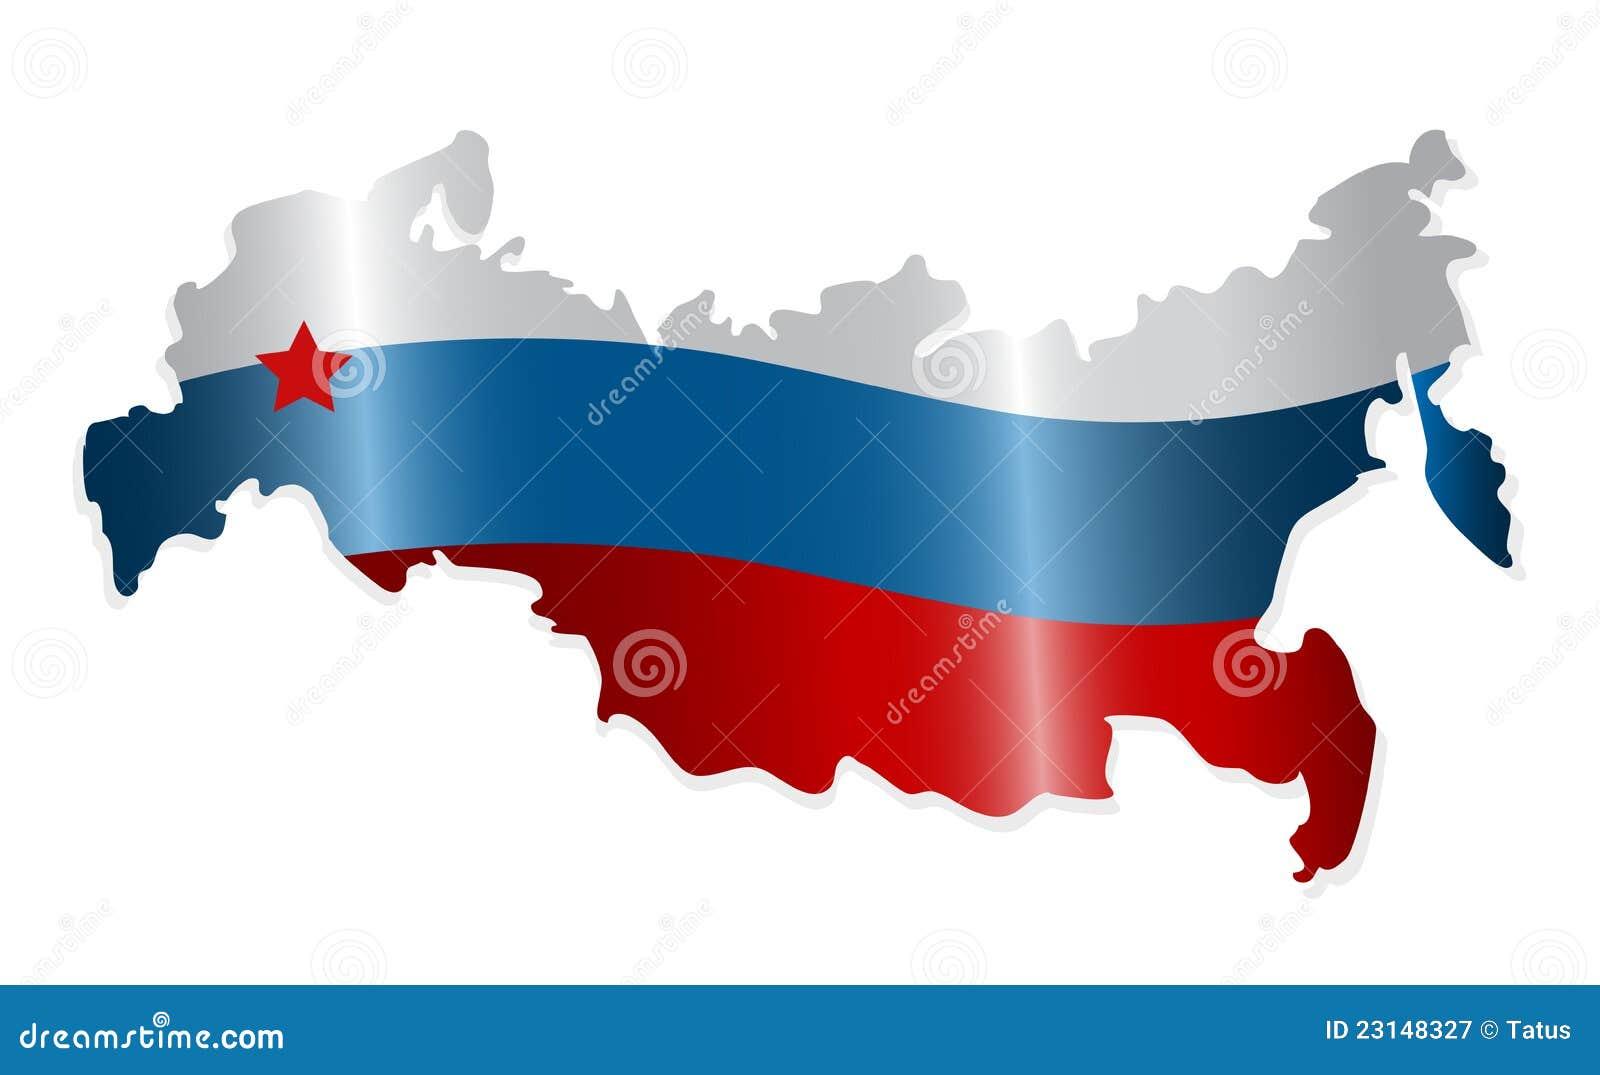 Federation Understand Russian 106